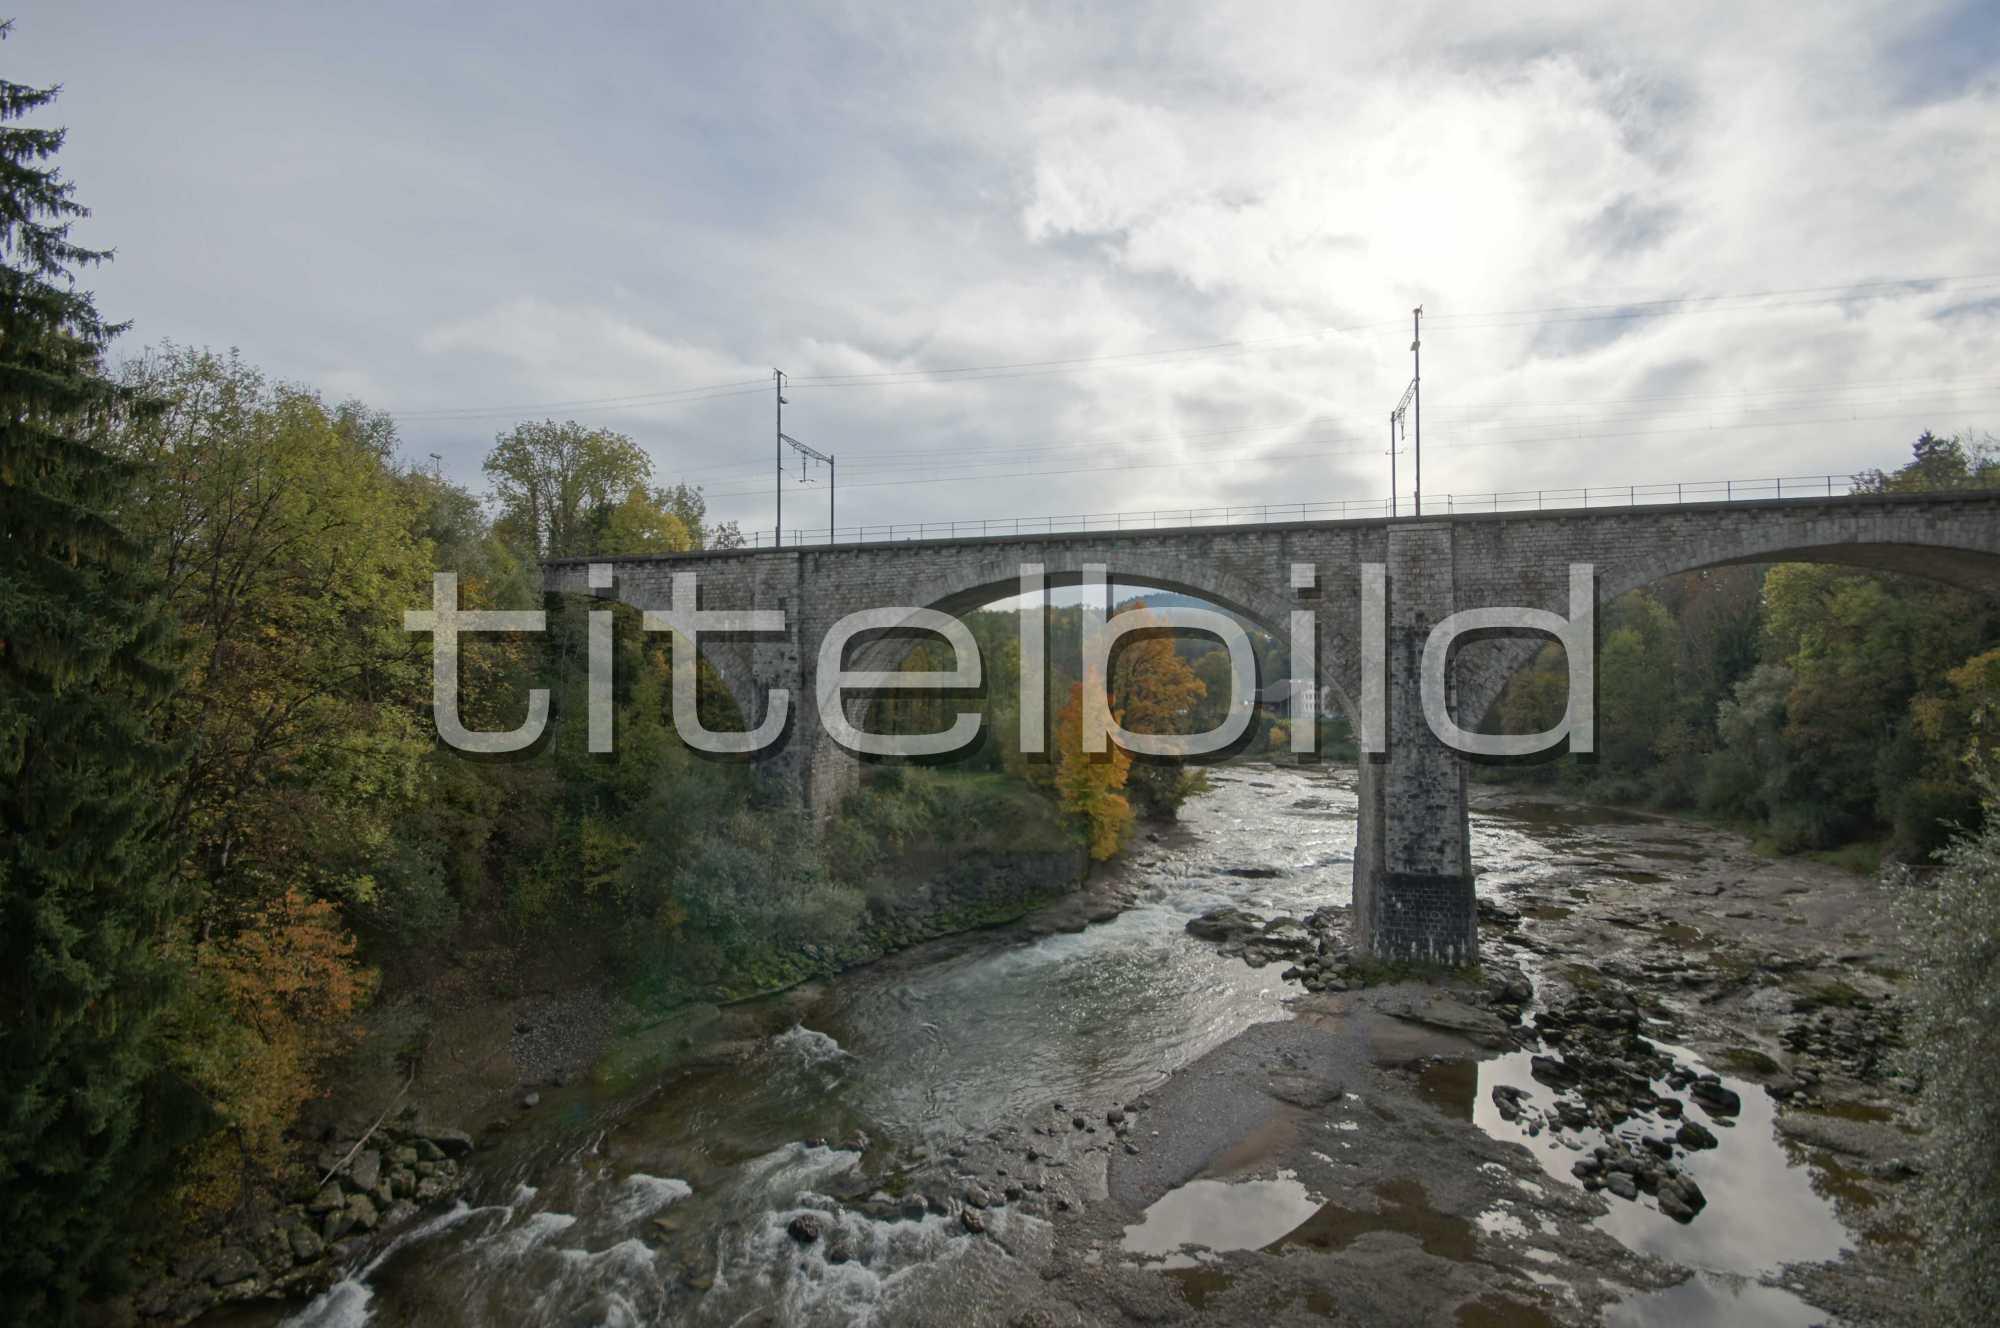 Projektbild-Nr. 2: Eisenbahnbrücke